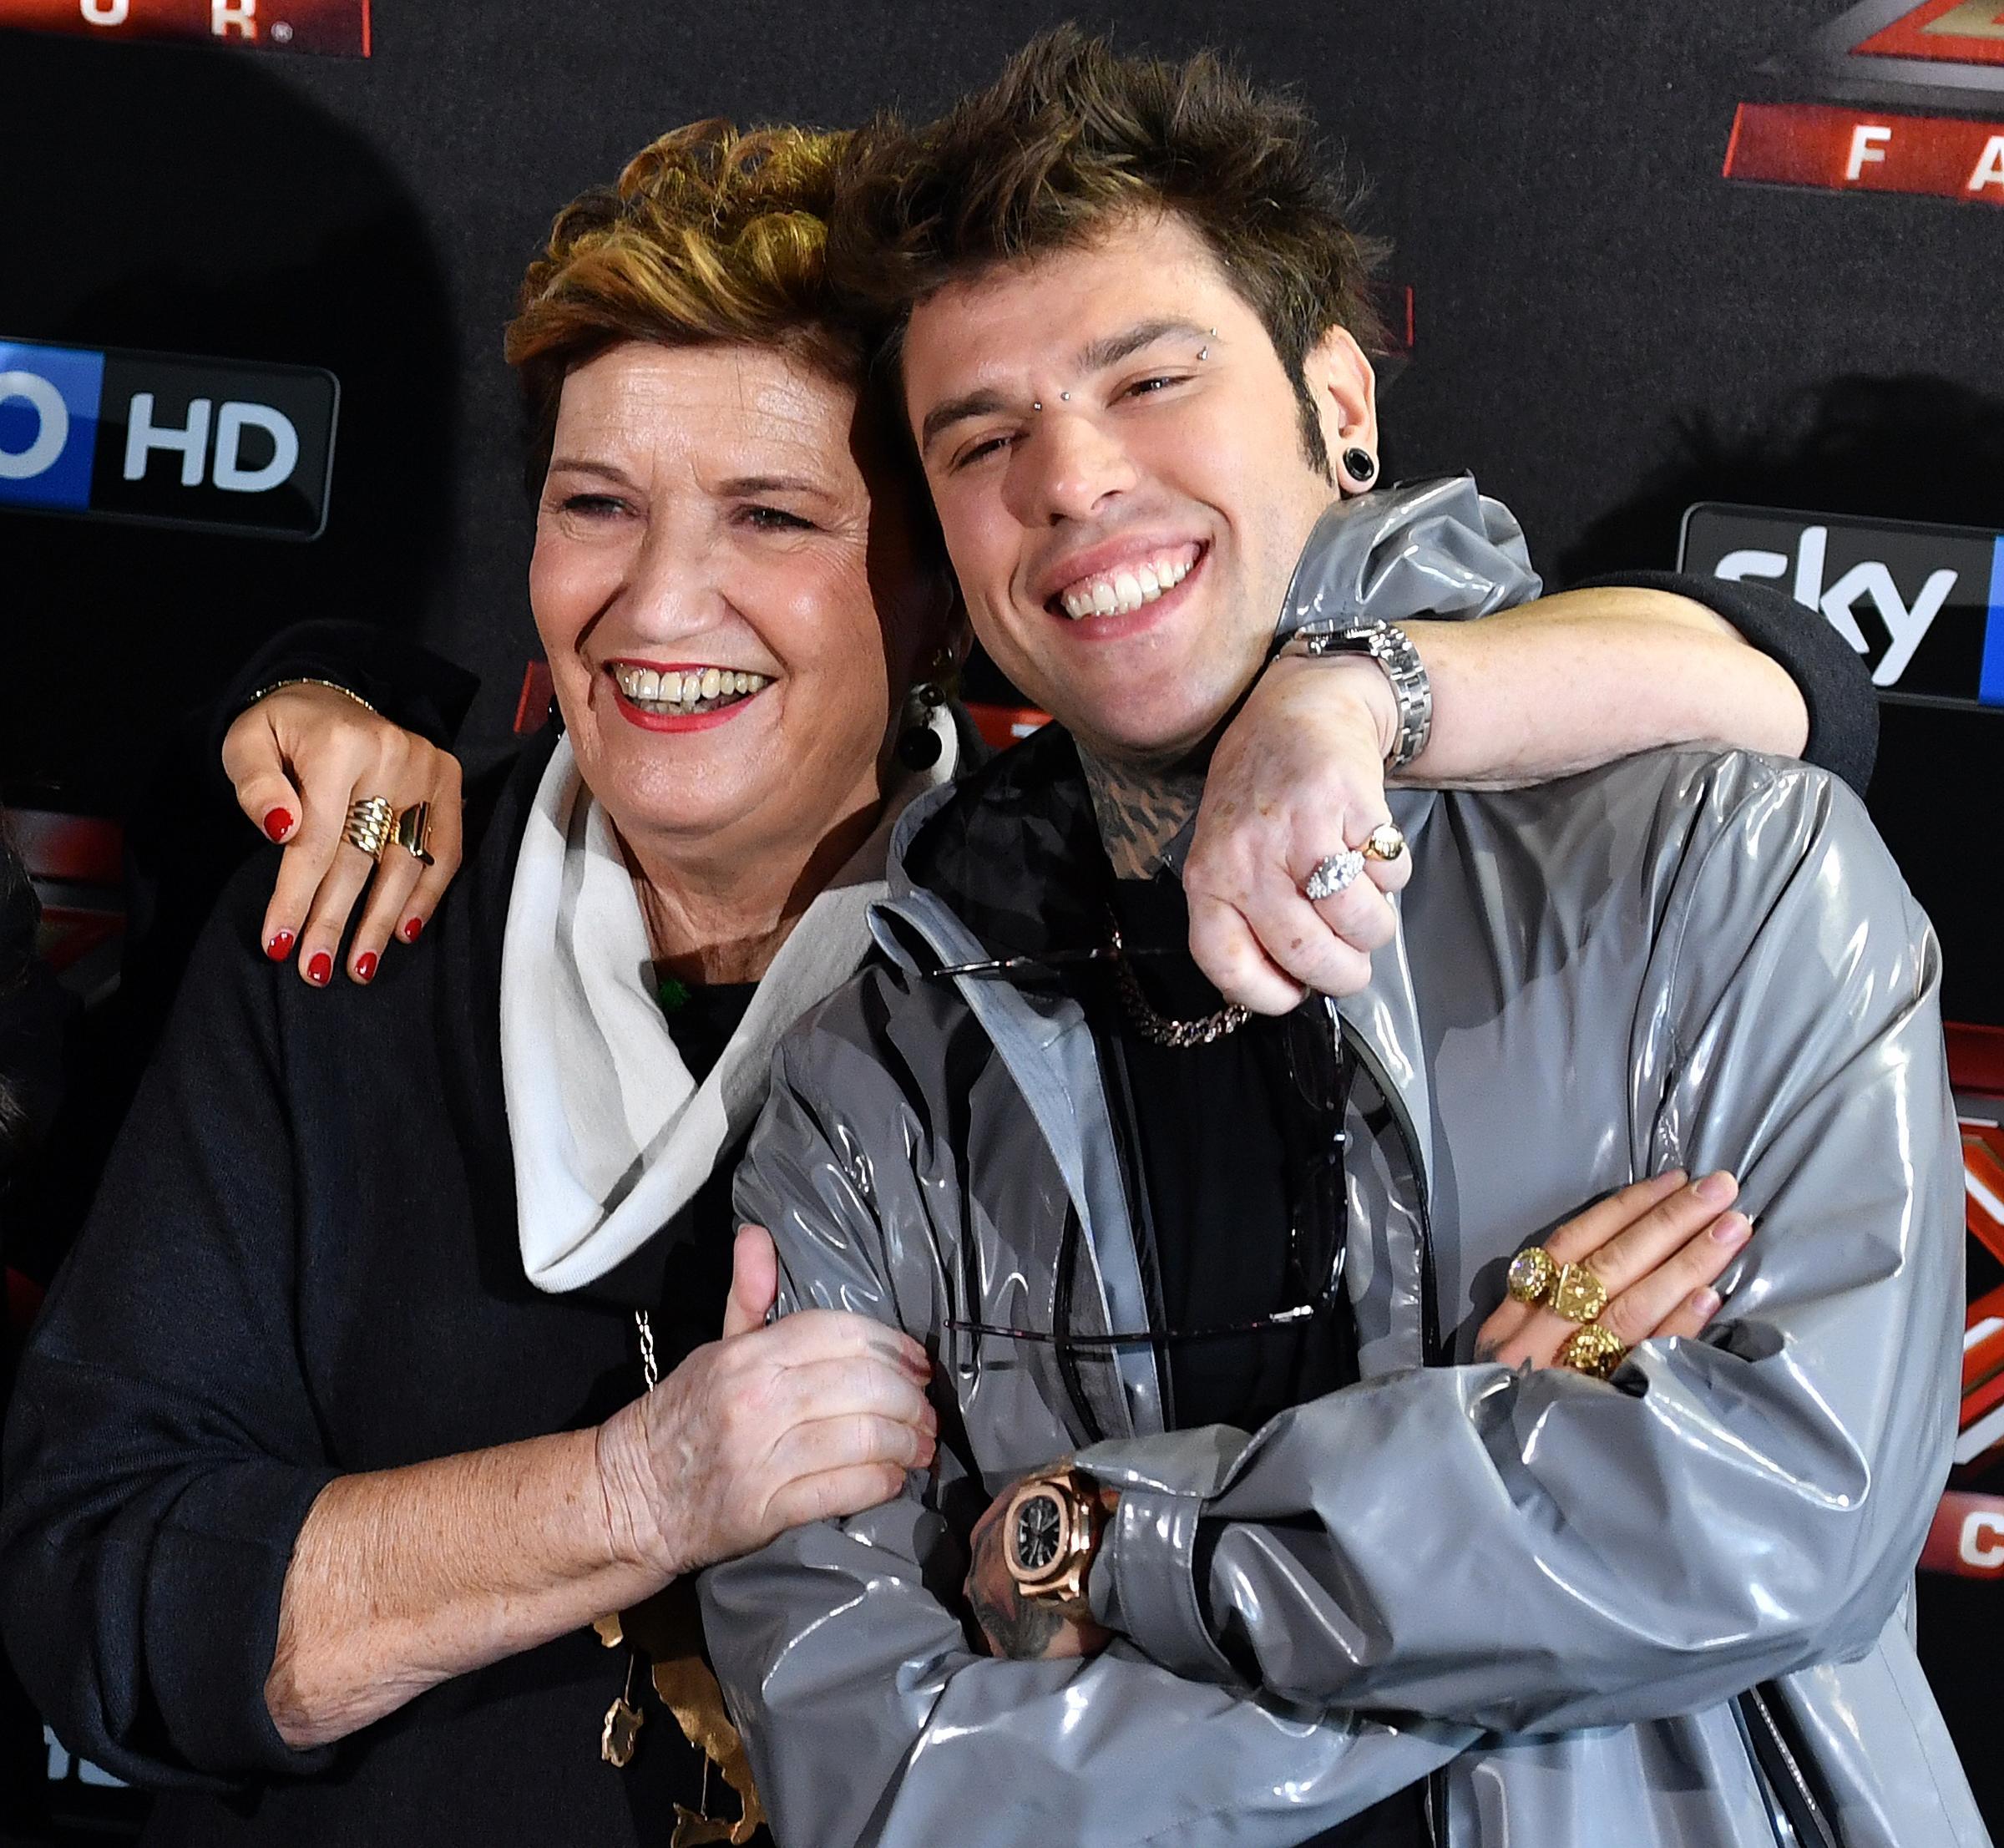 X Factor 2018, giudici: Fedez e Mara Maionchi riconfermati